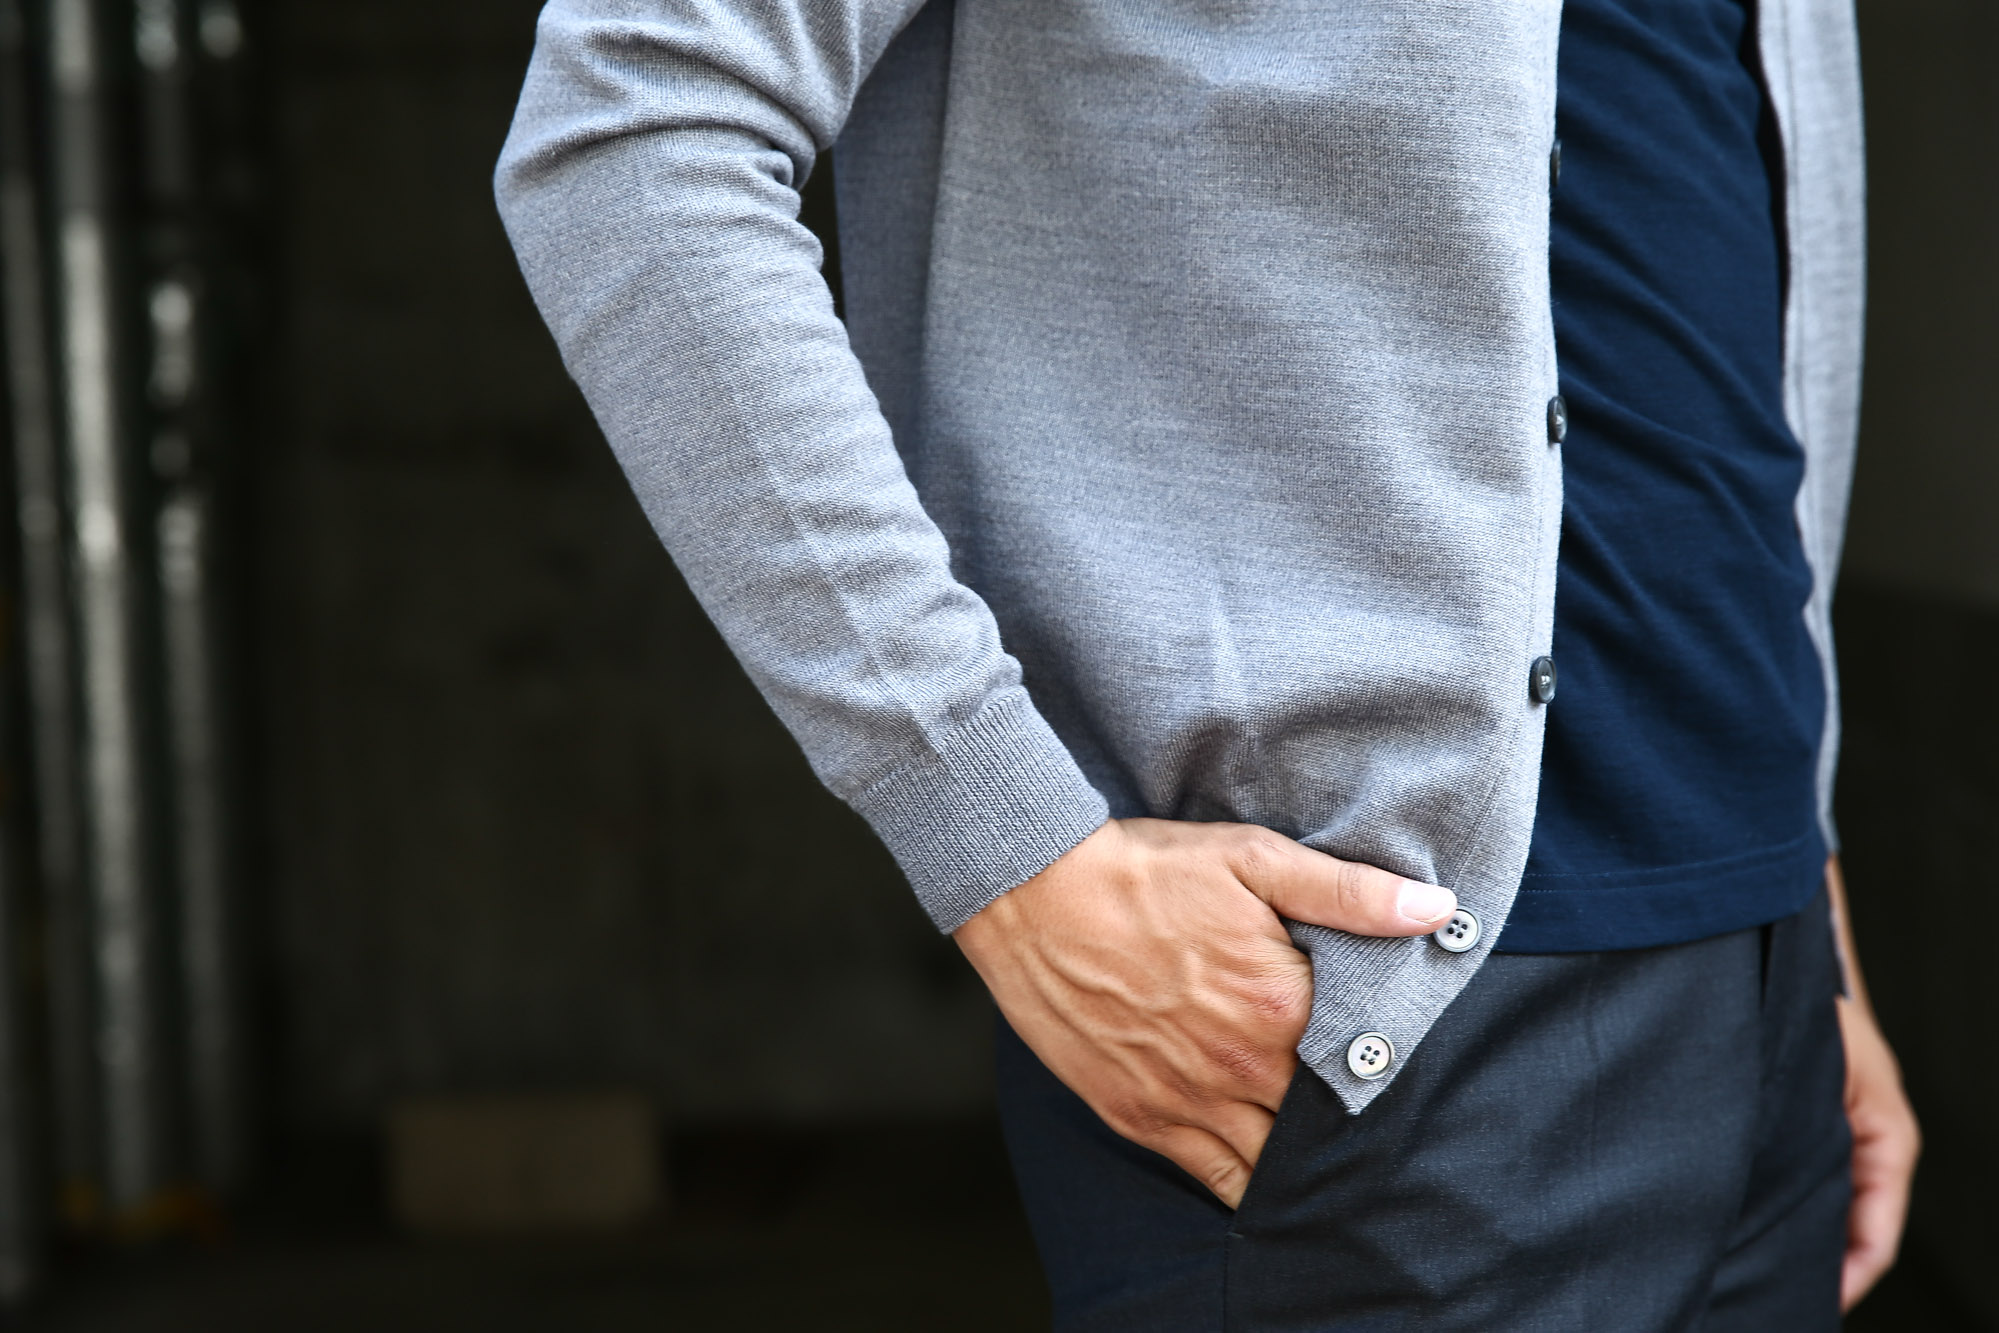 ZANONE (ザノーネ) CARDIGAN Sweaters V-Neck 811823 z0210 (Vネックカーディガン) GREY (グレー・Z3093) MADE IN ITALY のコーディネート画像。愛知 名古屋 Alto e Diritto アルト エ デリット ザノーネ 取扱い インコテックスとのコーディネート。